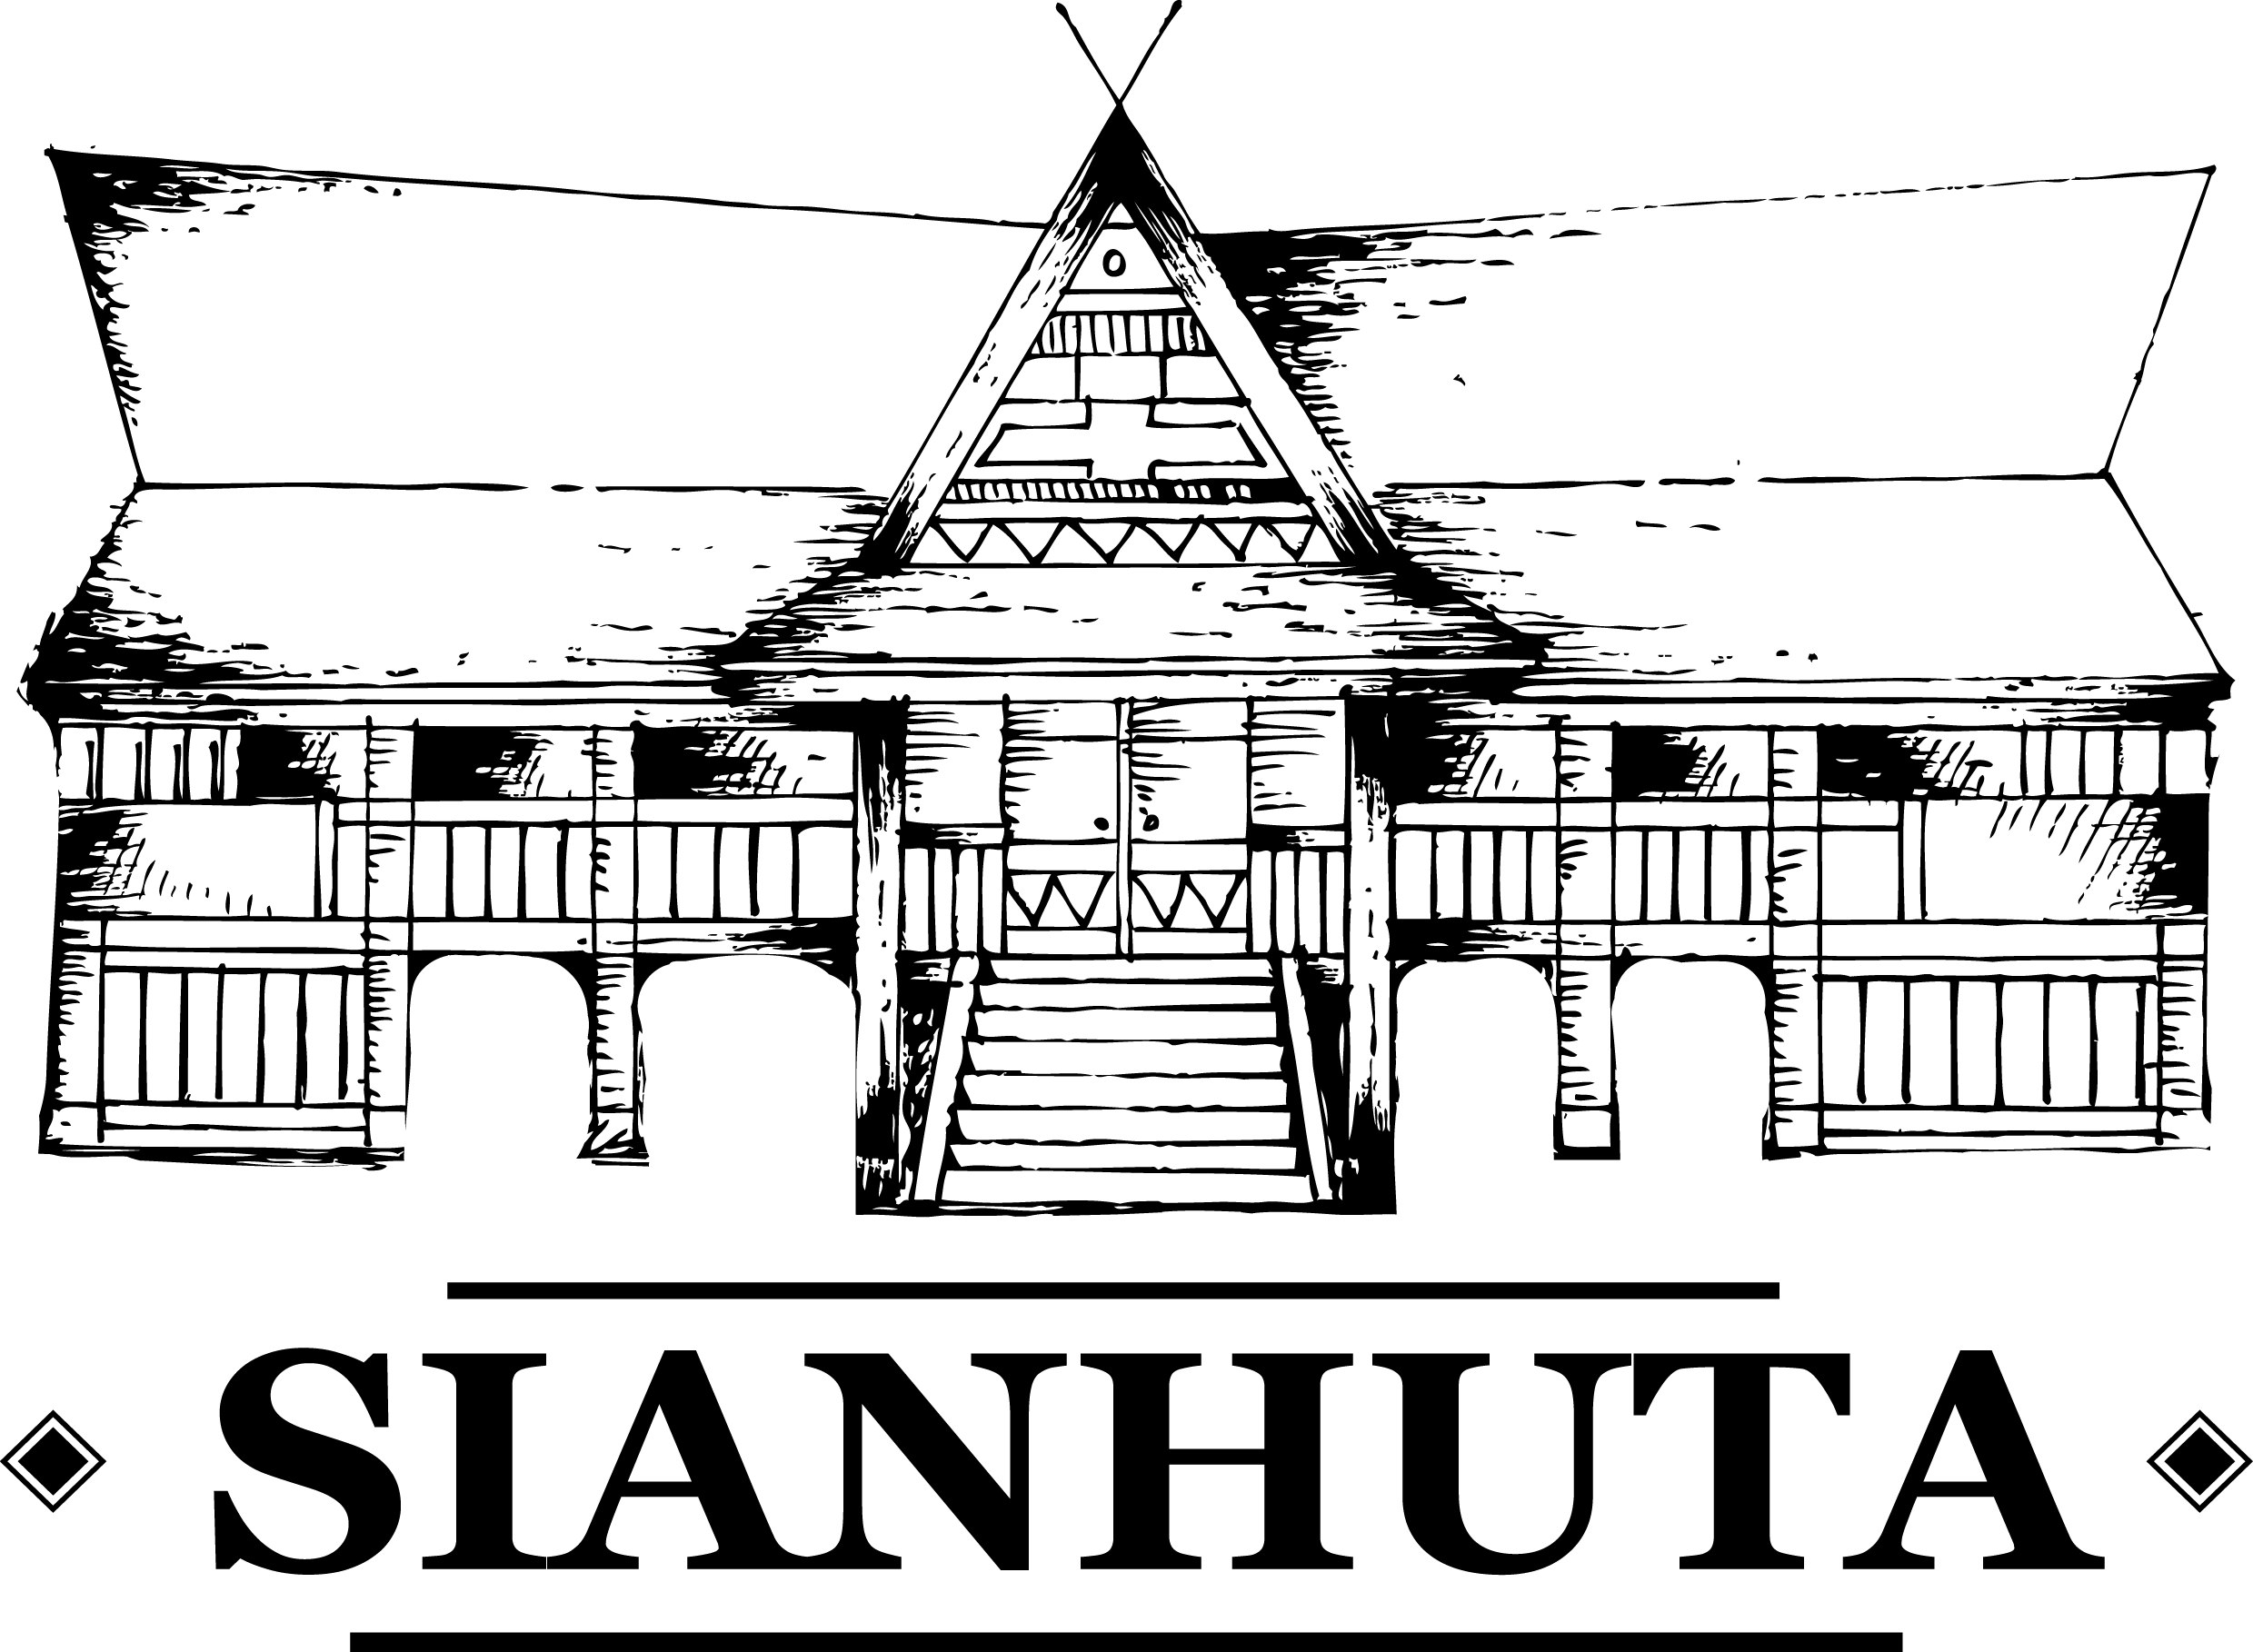 71b0ad4256